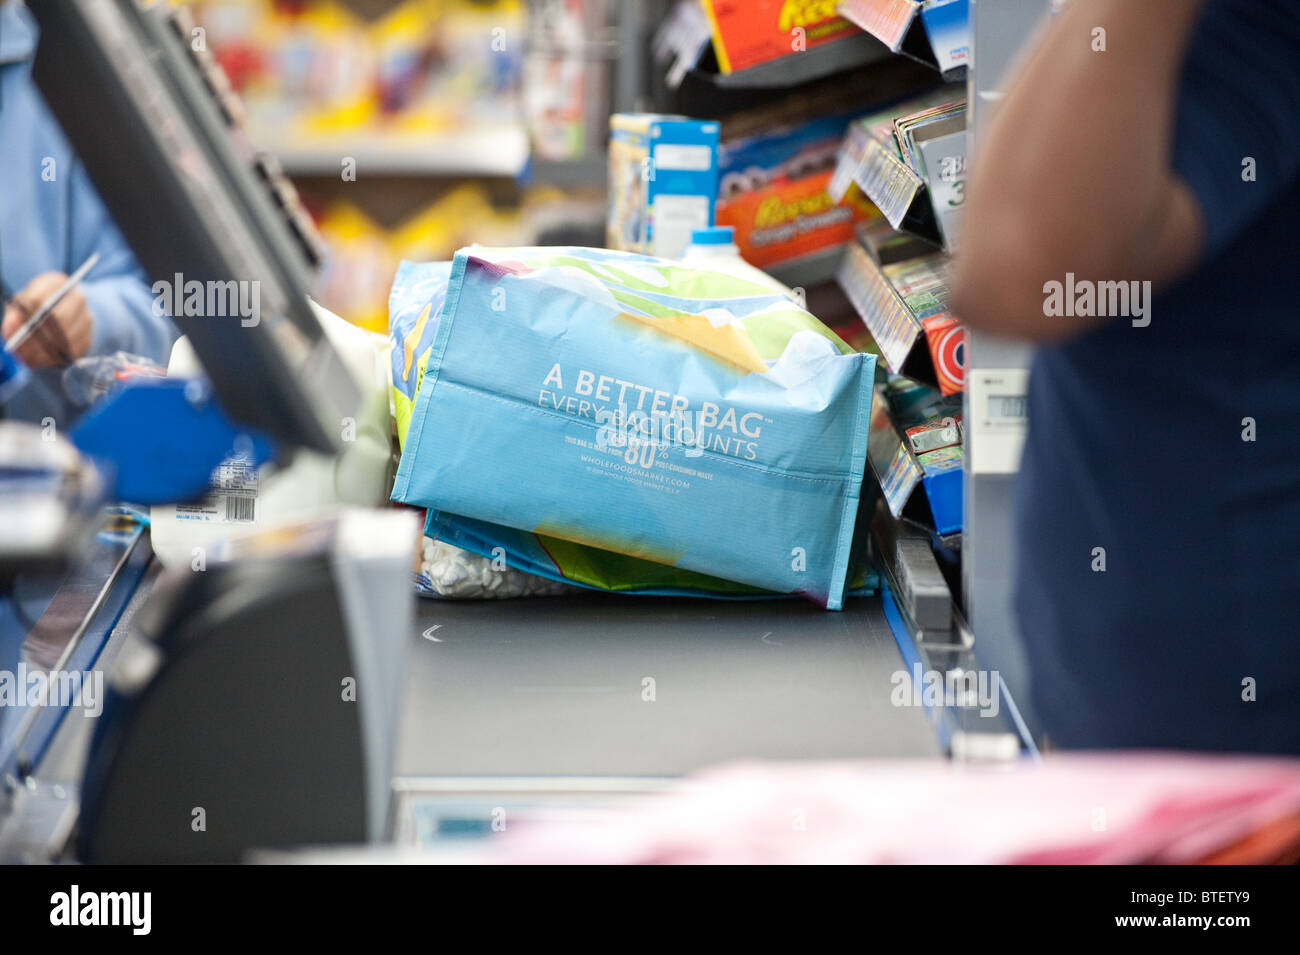 Customer uses reusable shopping bag at Wal-Mart in Austin, Texas. ©Marjorie Kamys Cotera - Stock Image